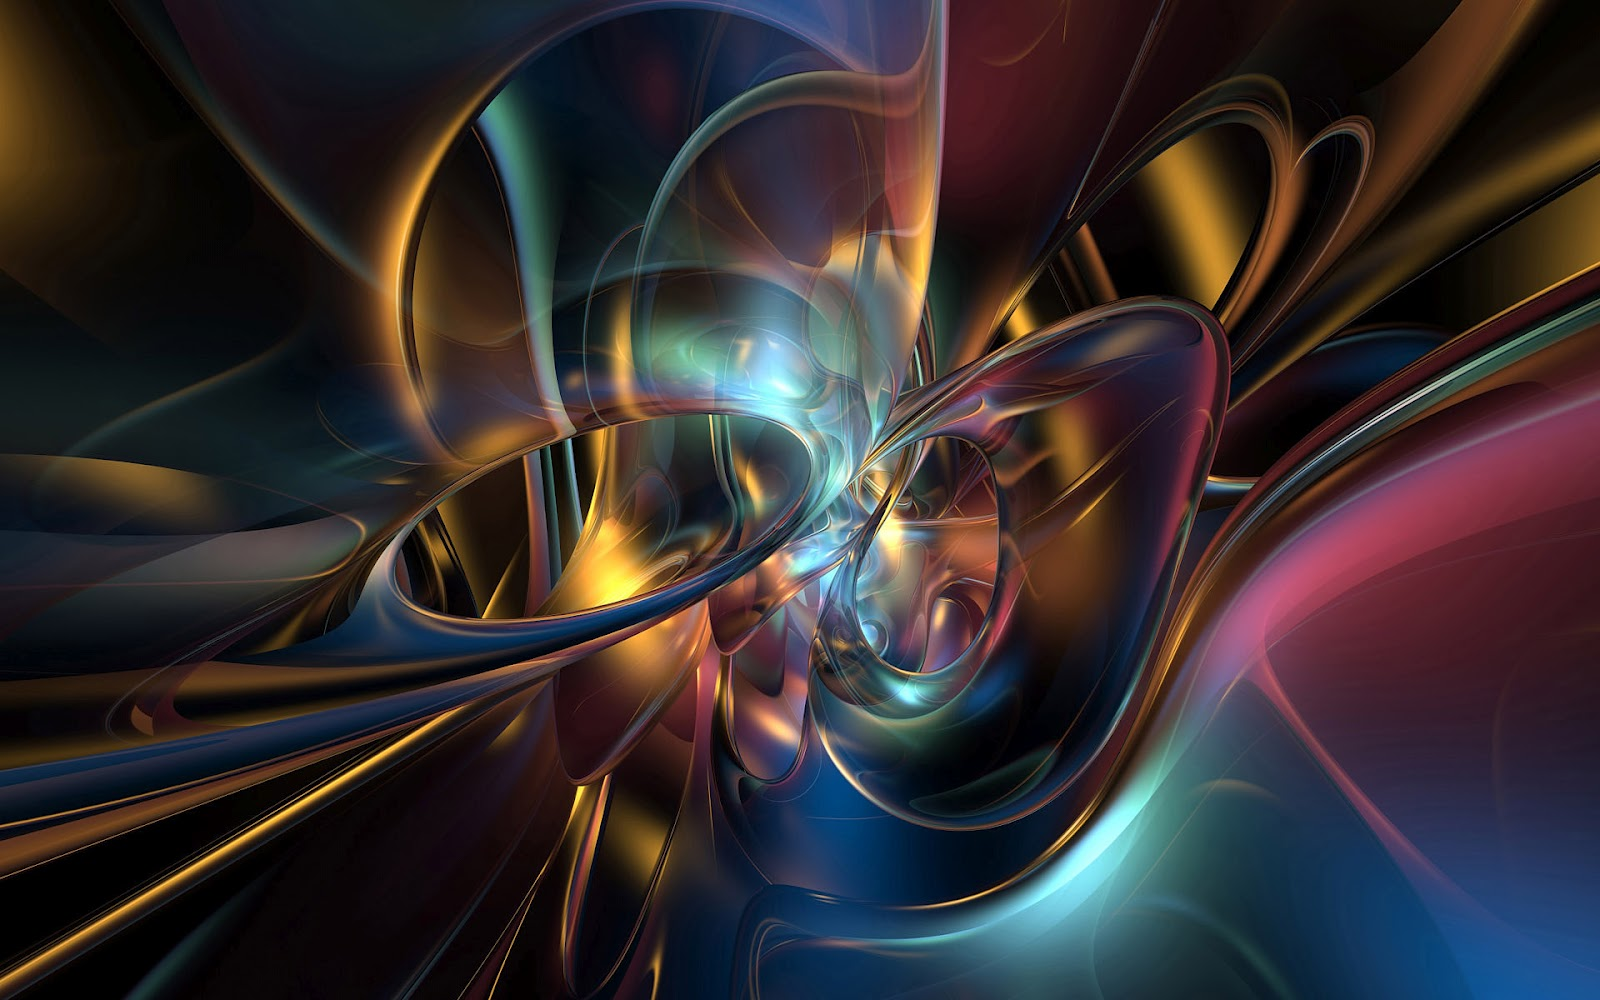 3d abstract wallpapers top best hd wallpapers for desktop for Best 3d wallpaper